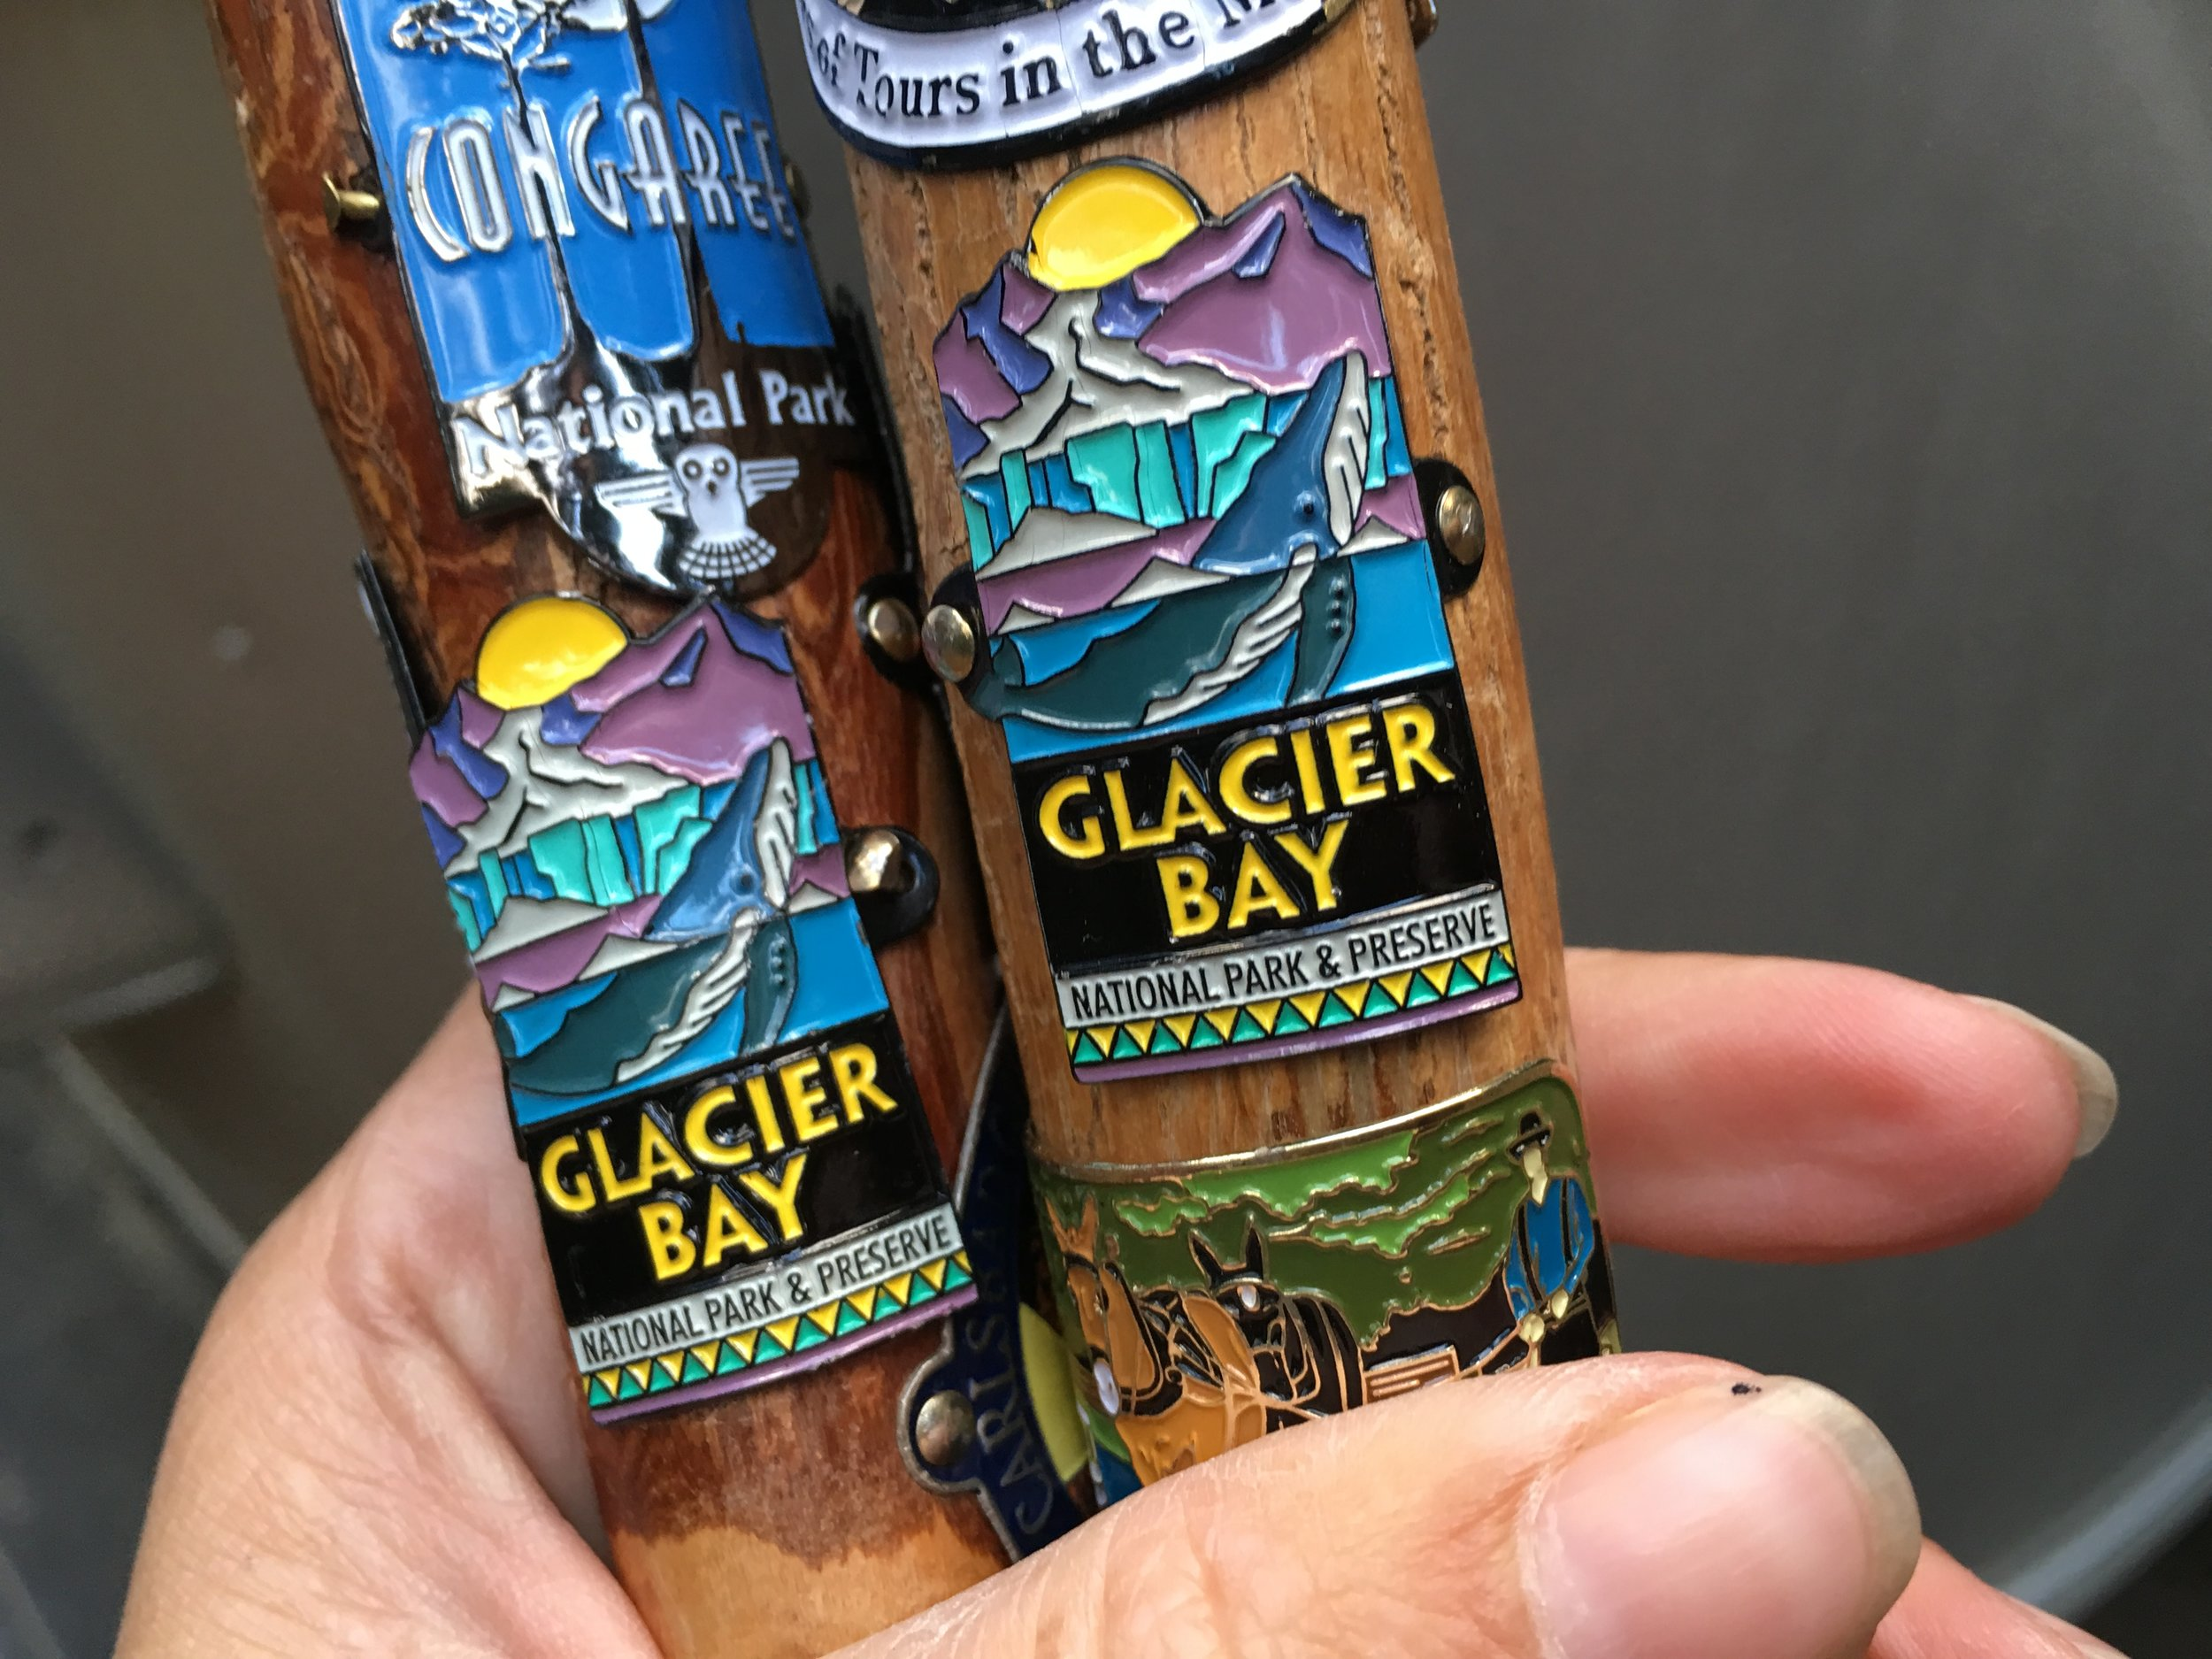 Hiking stick medallions from Glacier Bay National Park in Alaska.